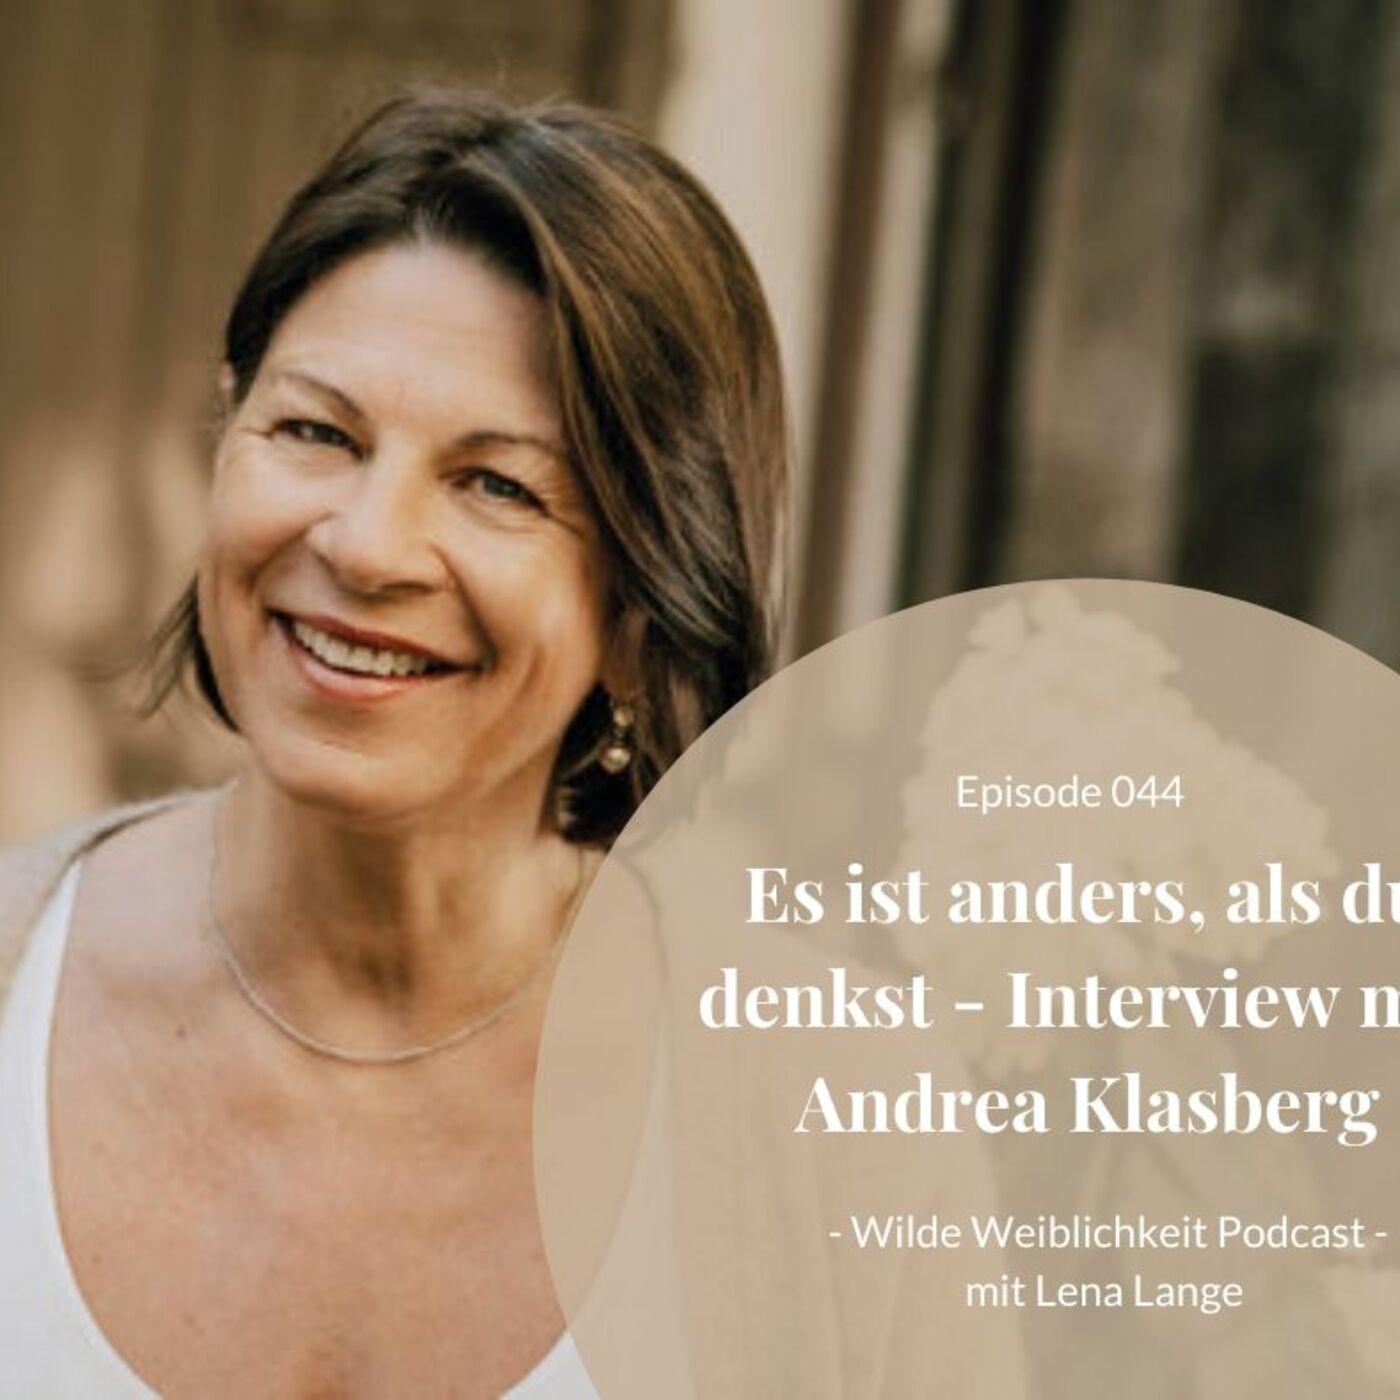 044 - Es ist alles anders, als du denkst - Interview mit Andrea Klasberg